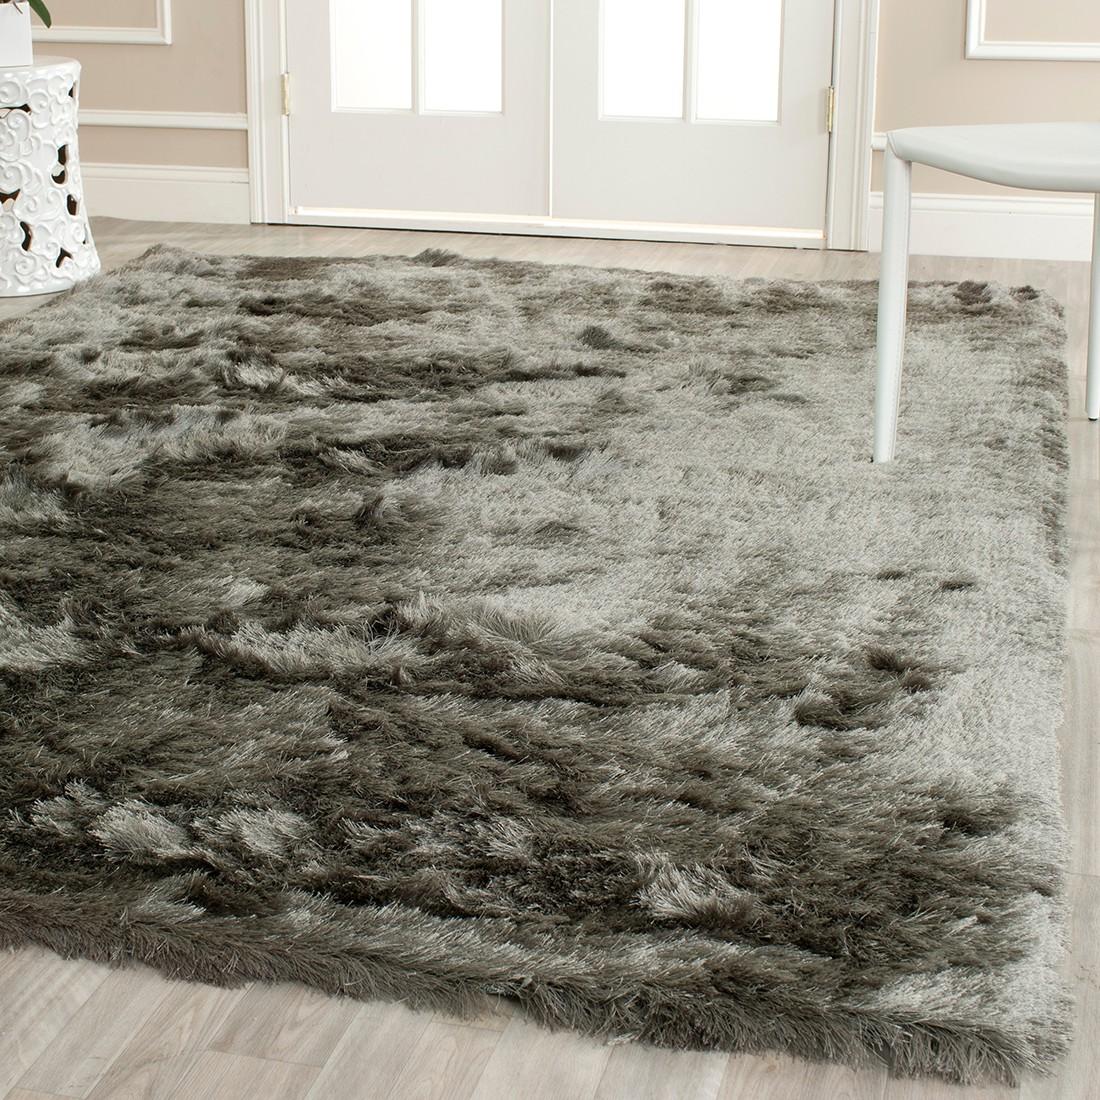 teppich chatham dunkelgrau 153 x 214 cm safavieh. Black Bedroom Furniture Sets. Home Design Ideas